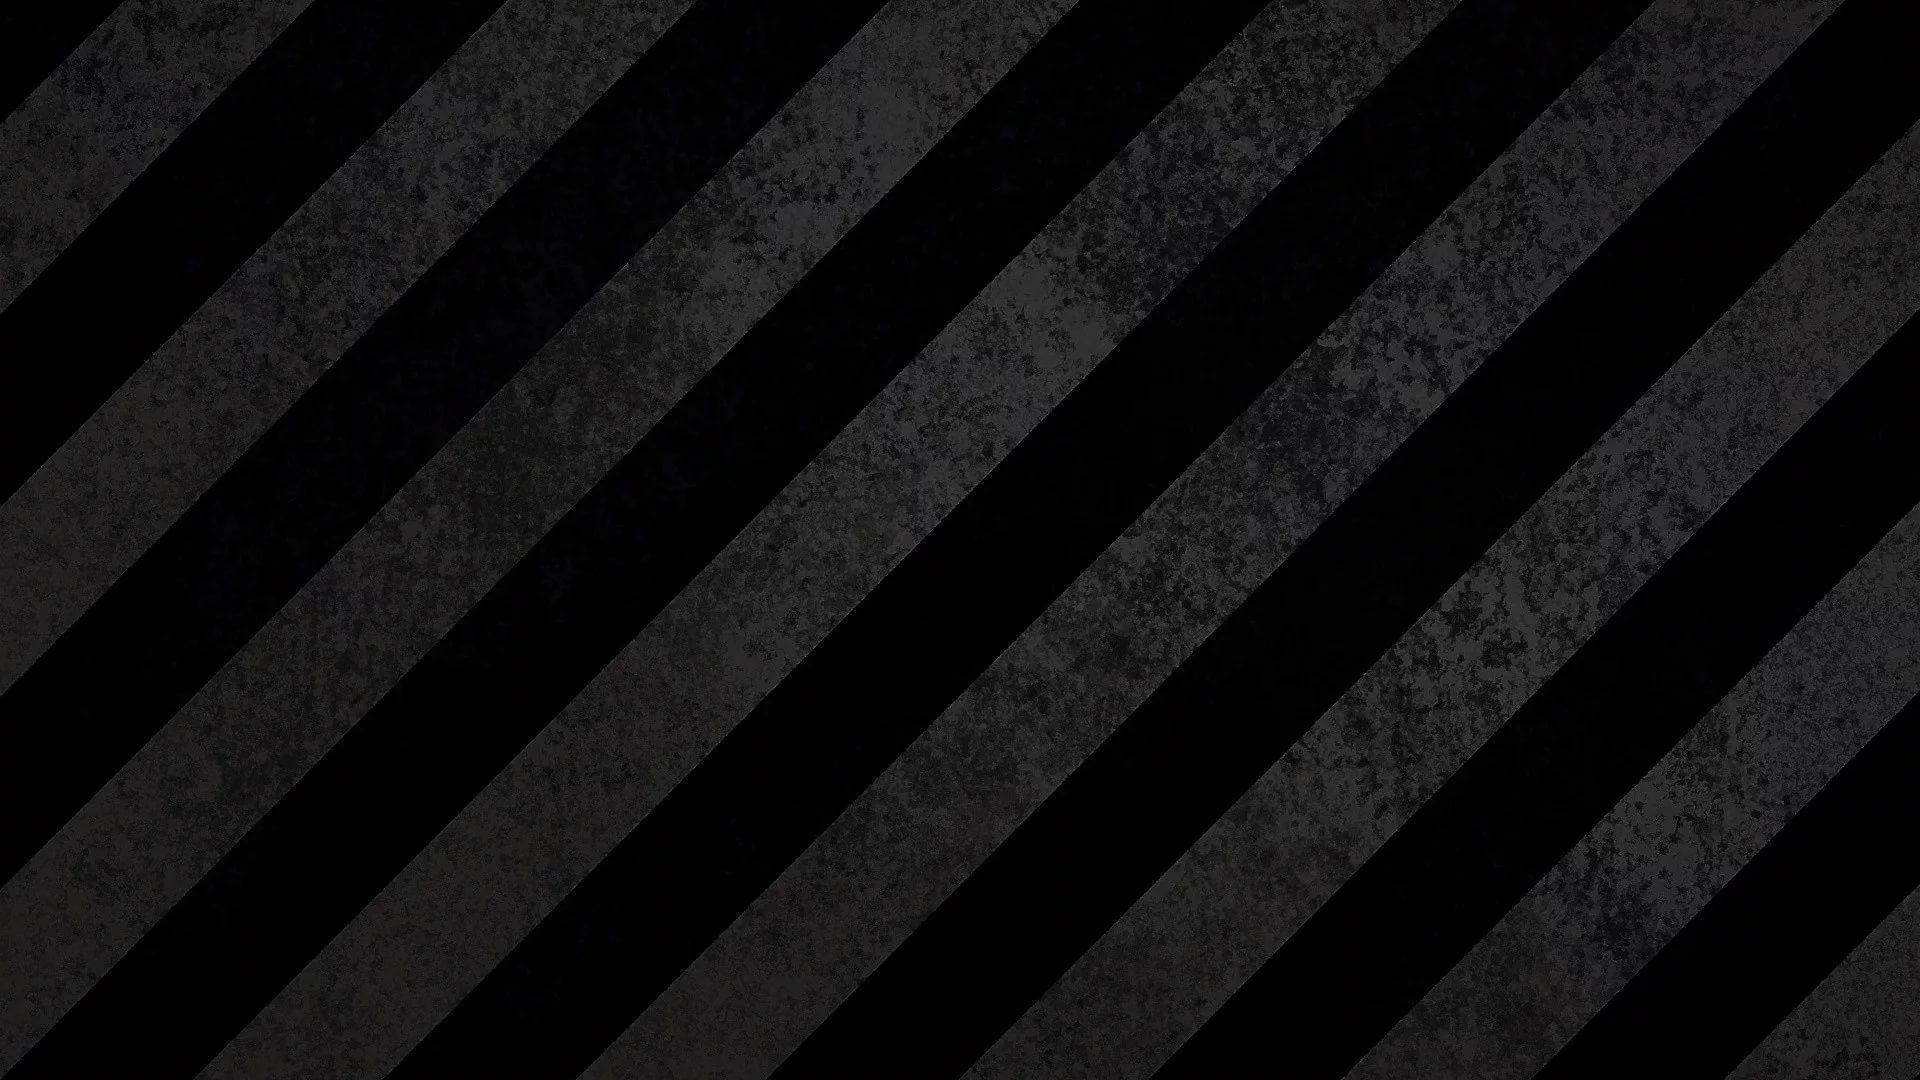 Black Screen Wallpapers 21 Images Wallpaperboat